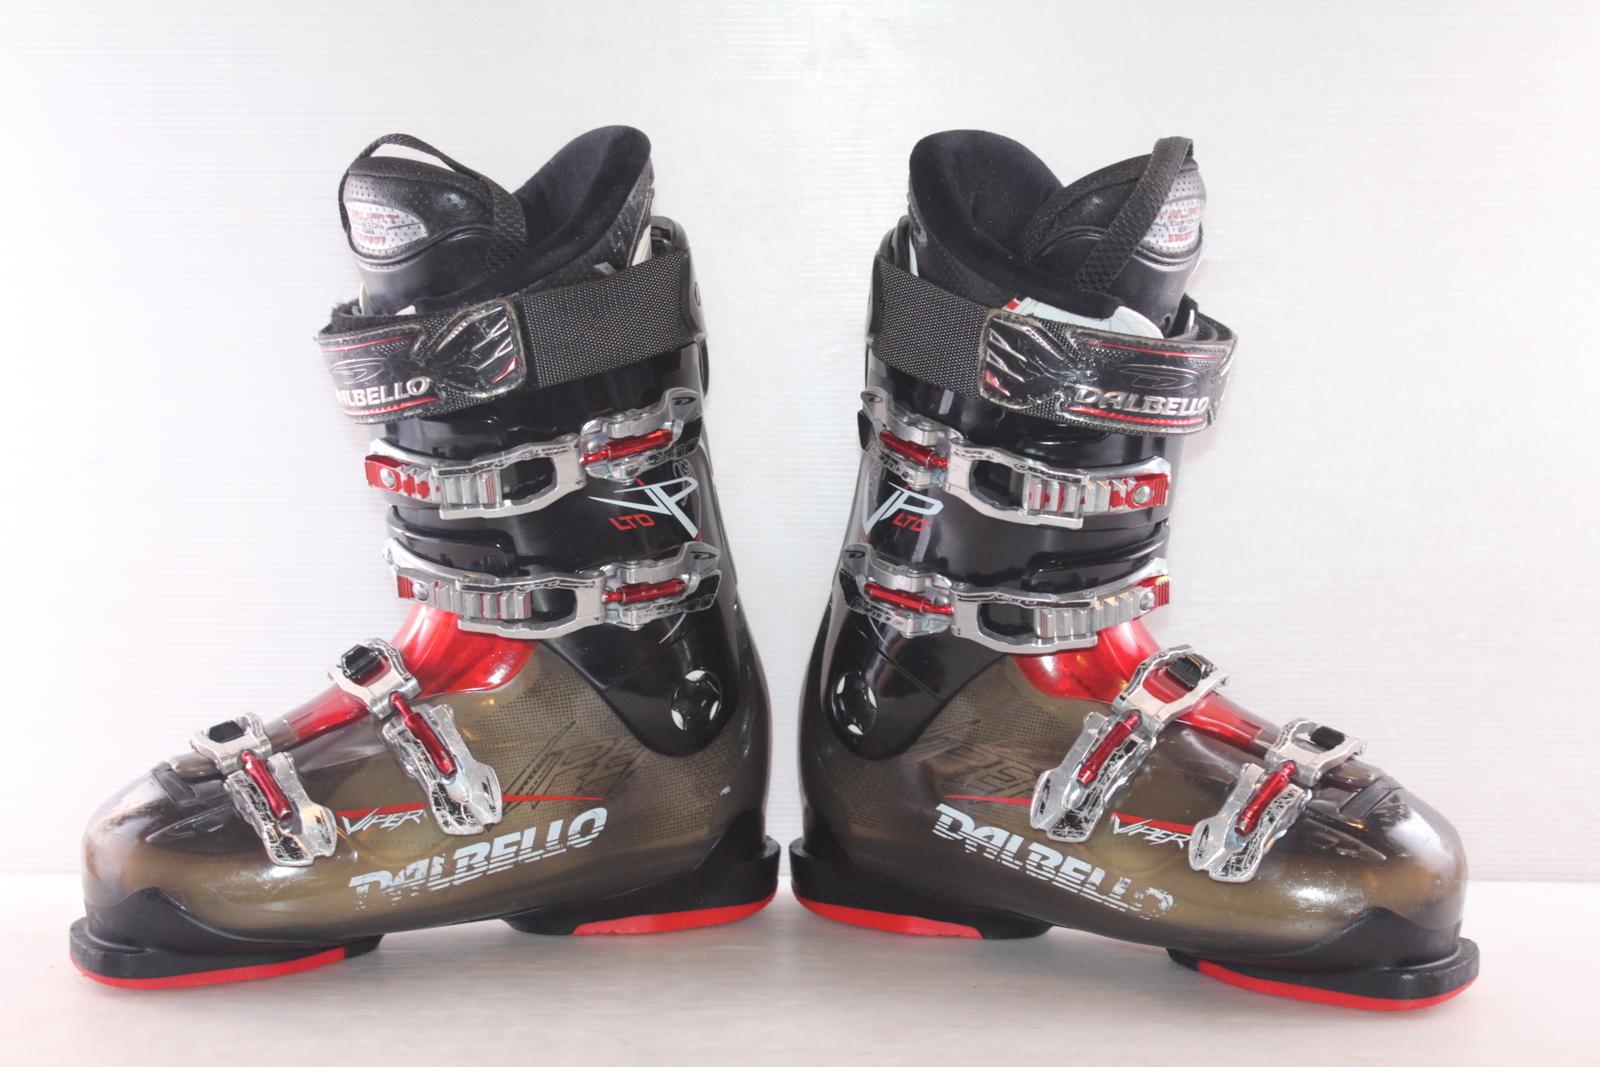 Lyžařské boty Dalbello Viper LTD vel. EU43.5 flexe 80